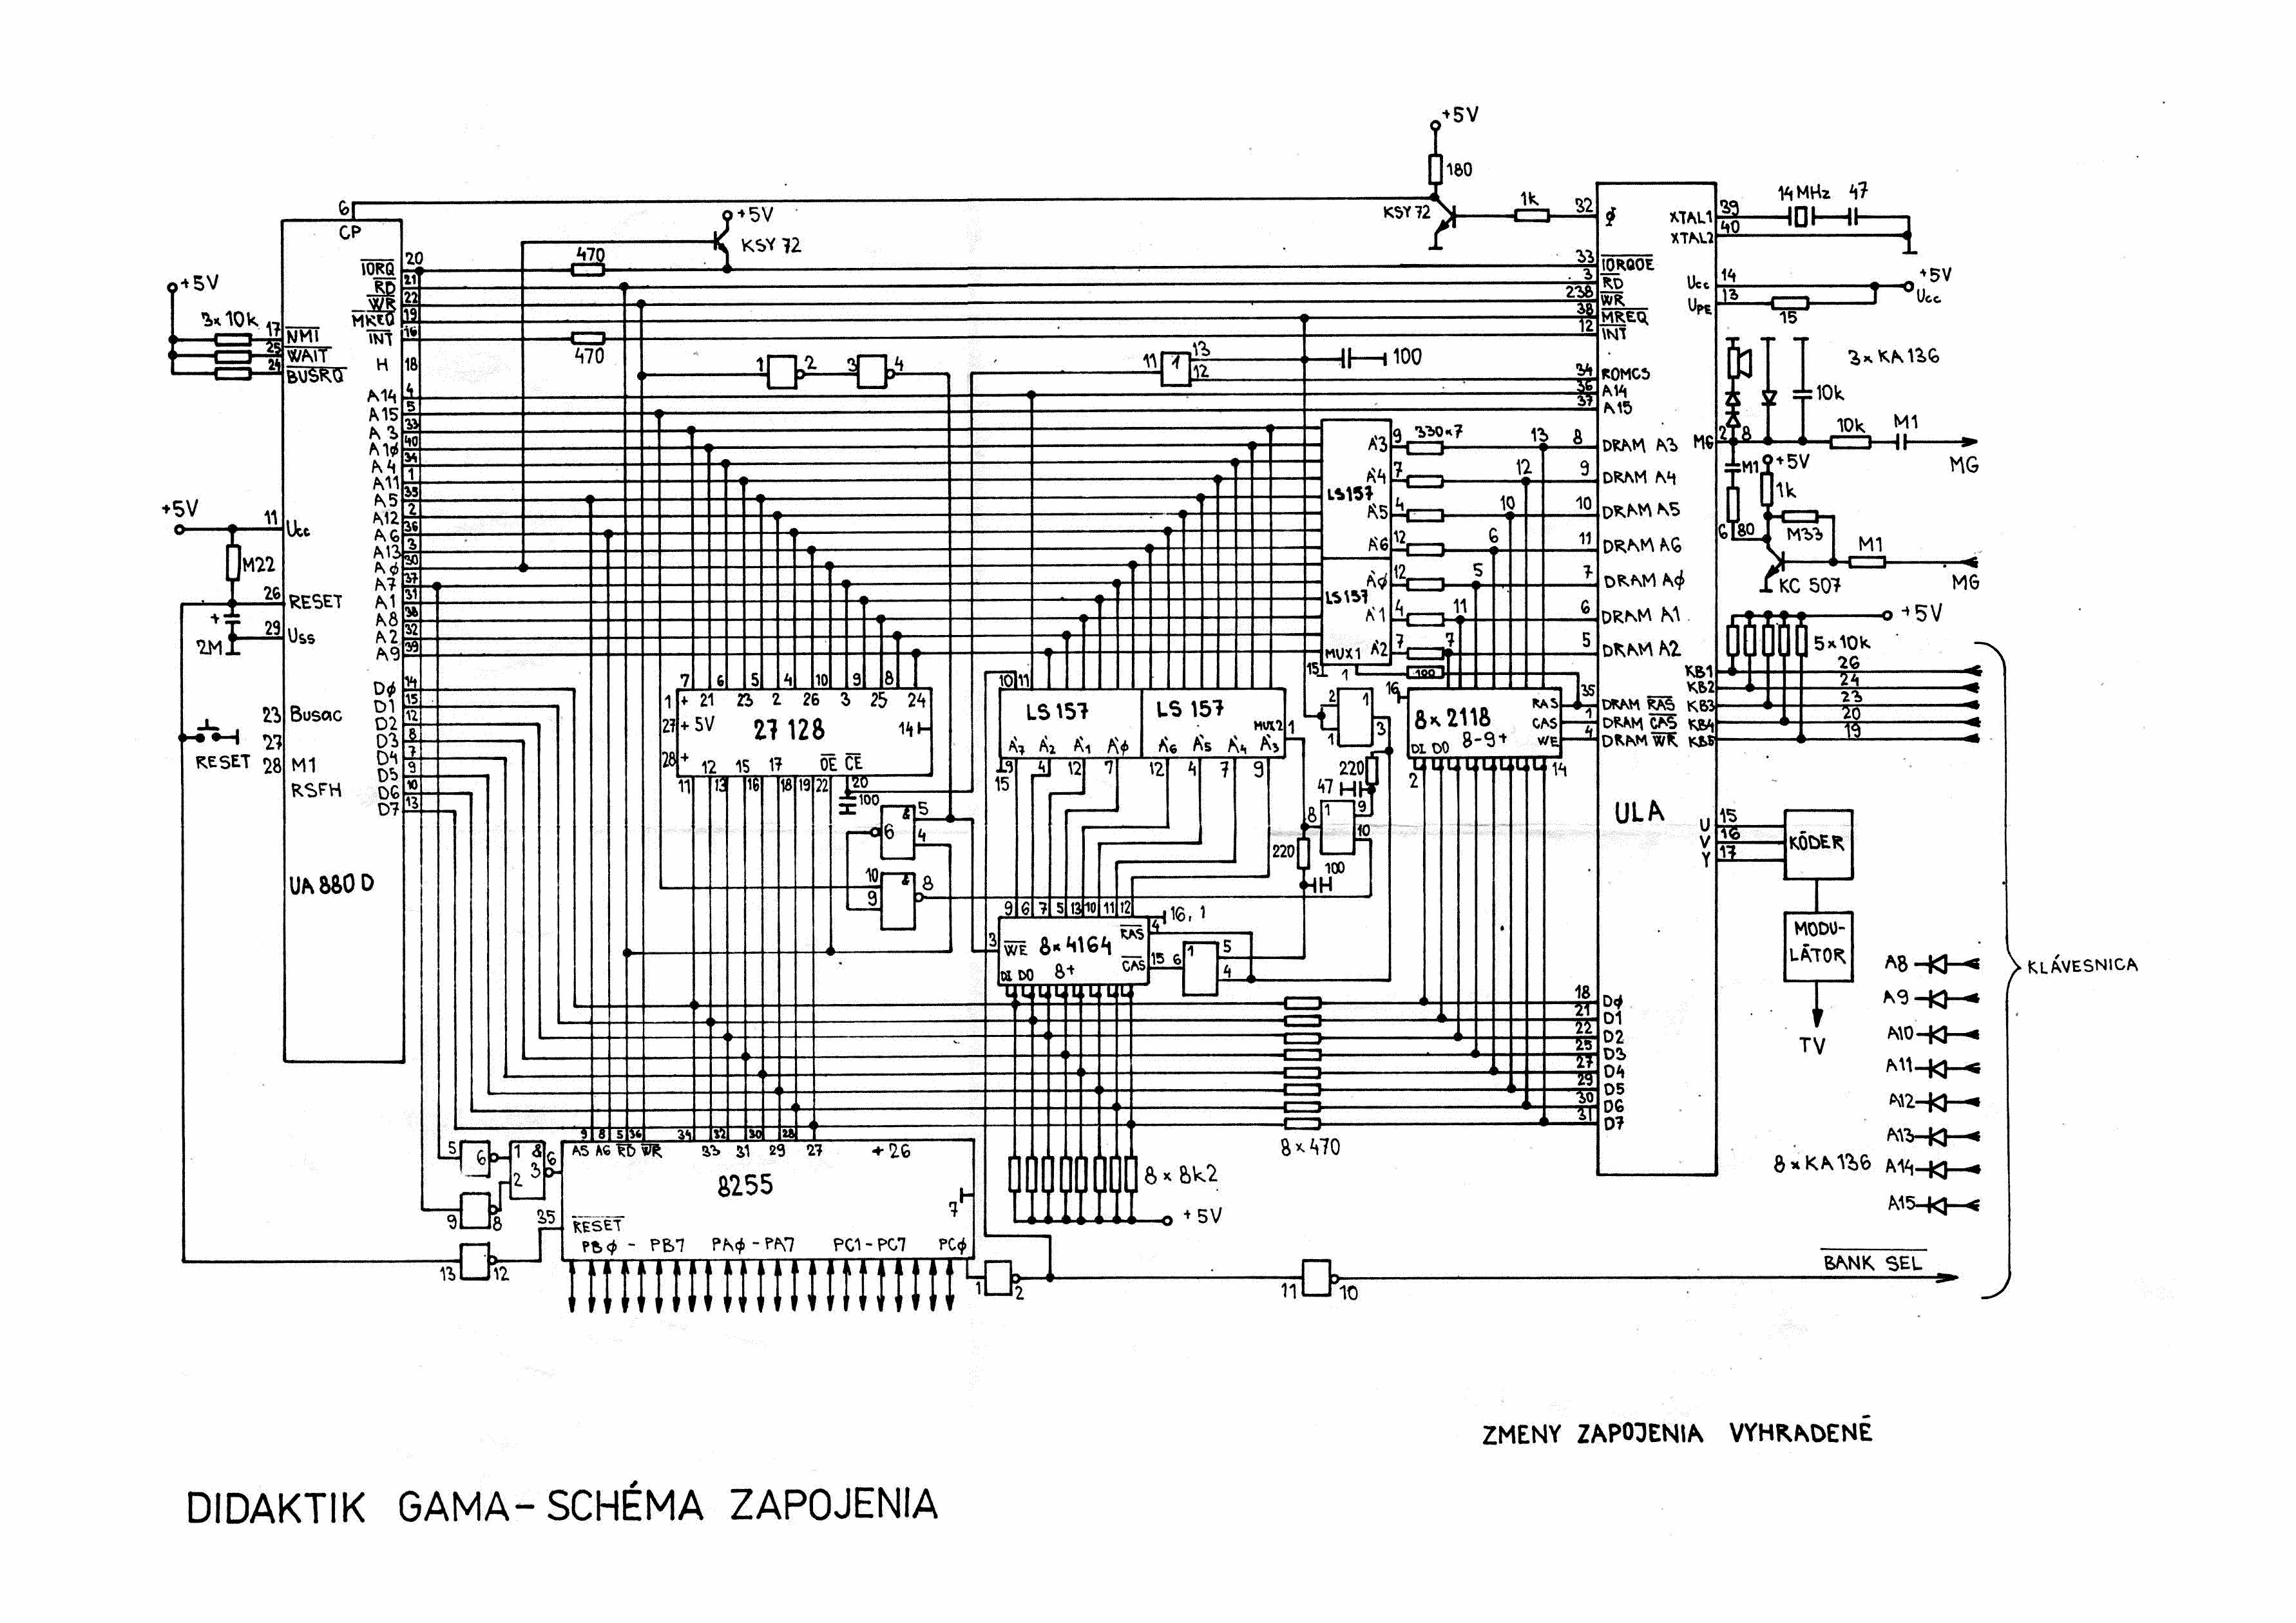 Hardware Z00ms Speccy Corner American Wiring Diagram 1972 Chevelle Gama 89 Didaktik Gama89